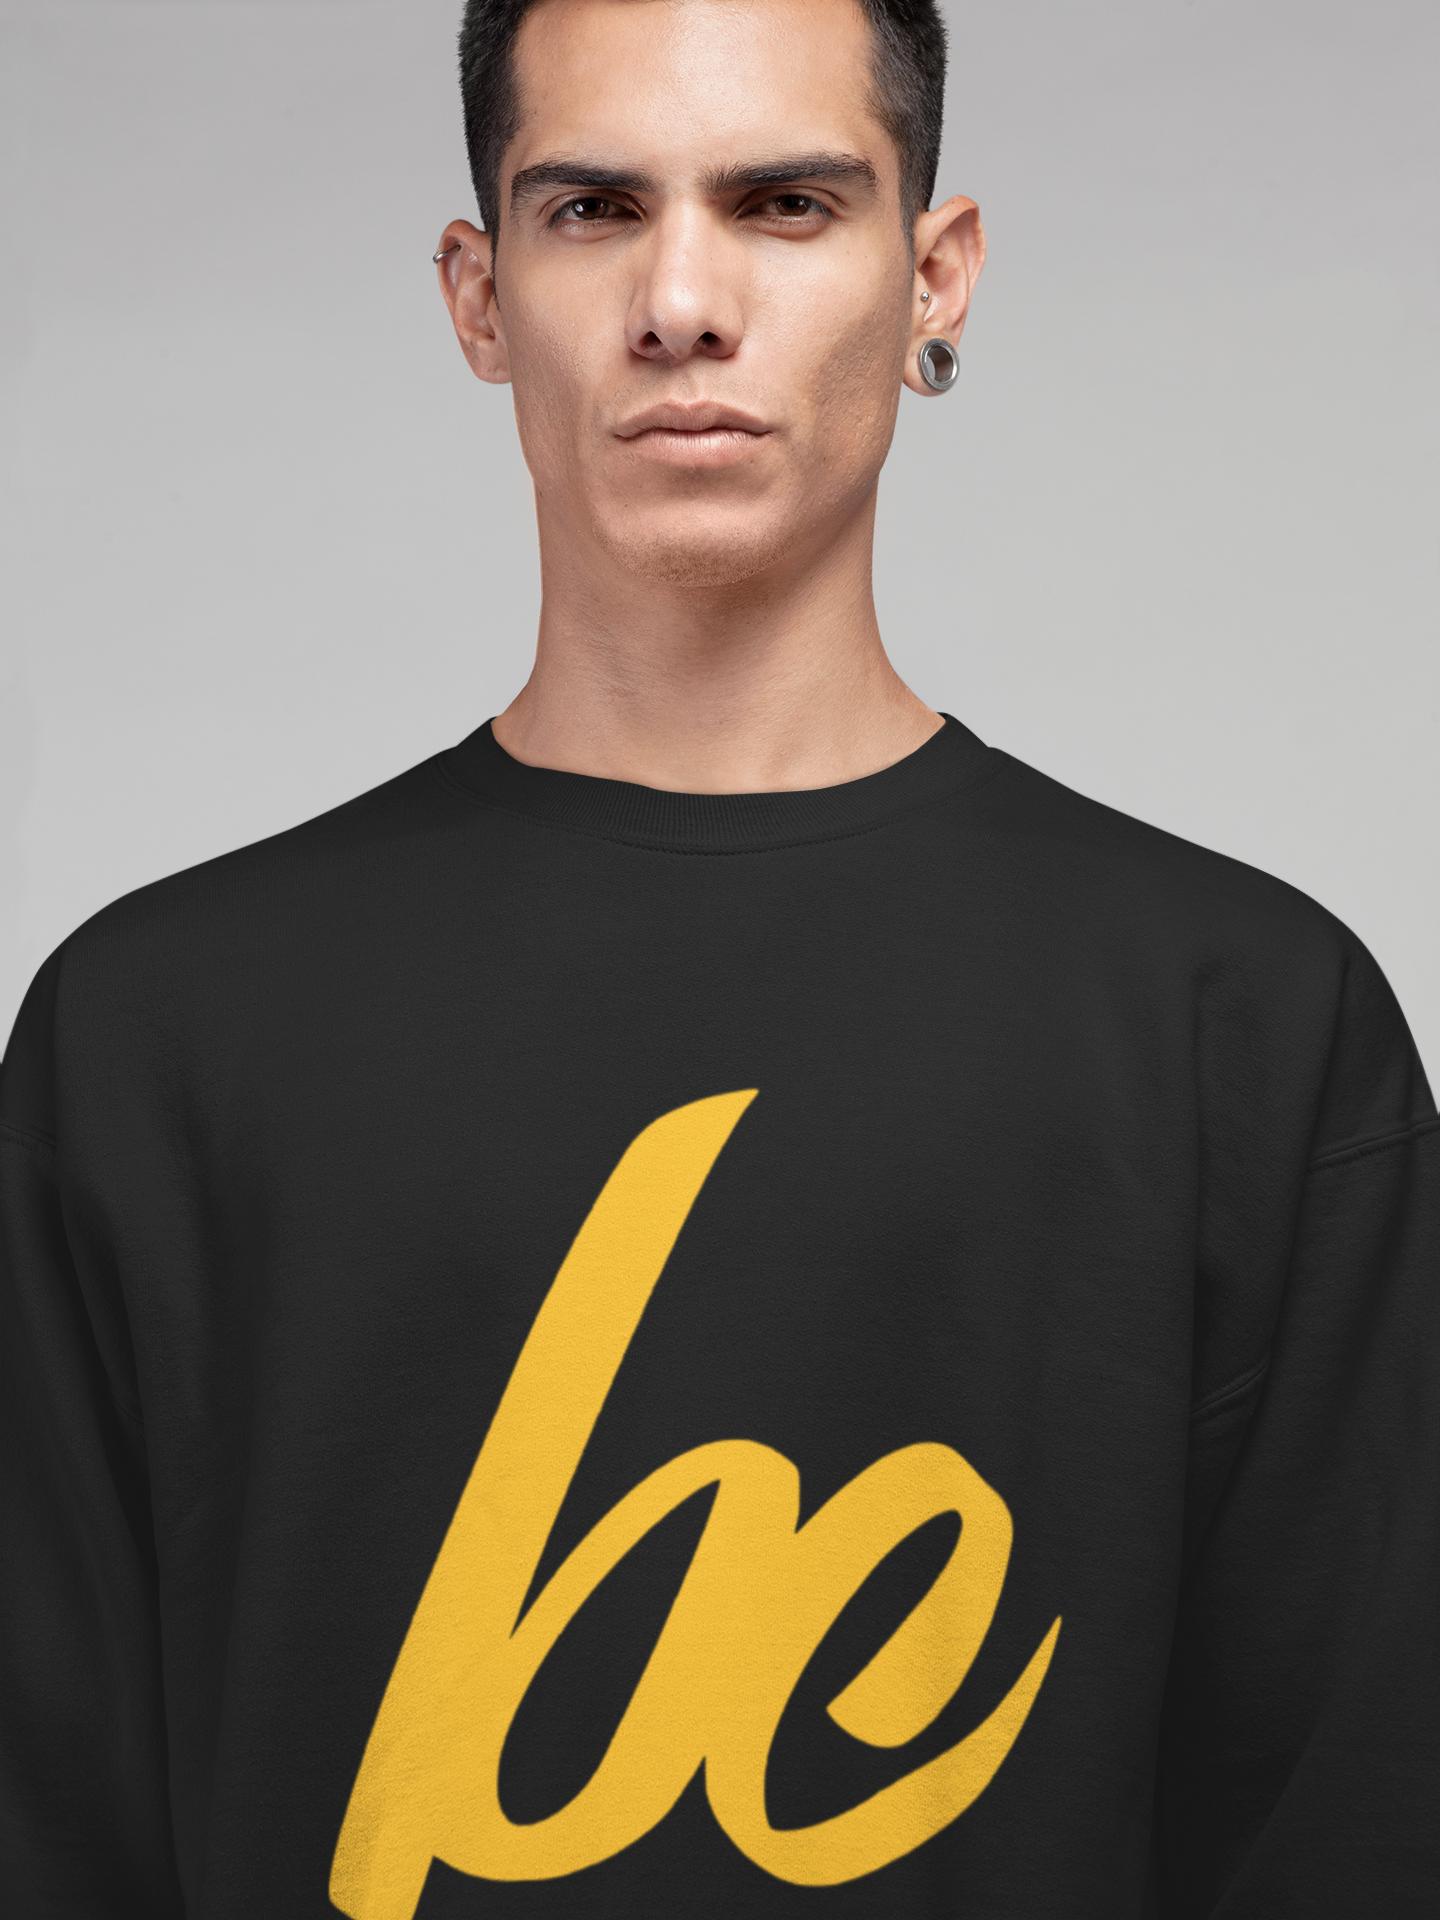 Exclusive Gold BC Crewneck Sweater